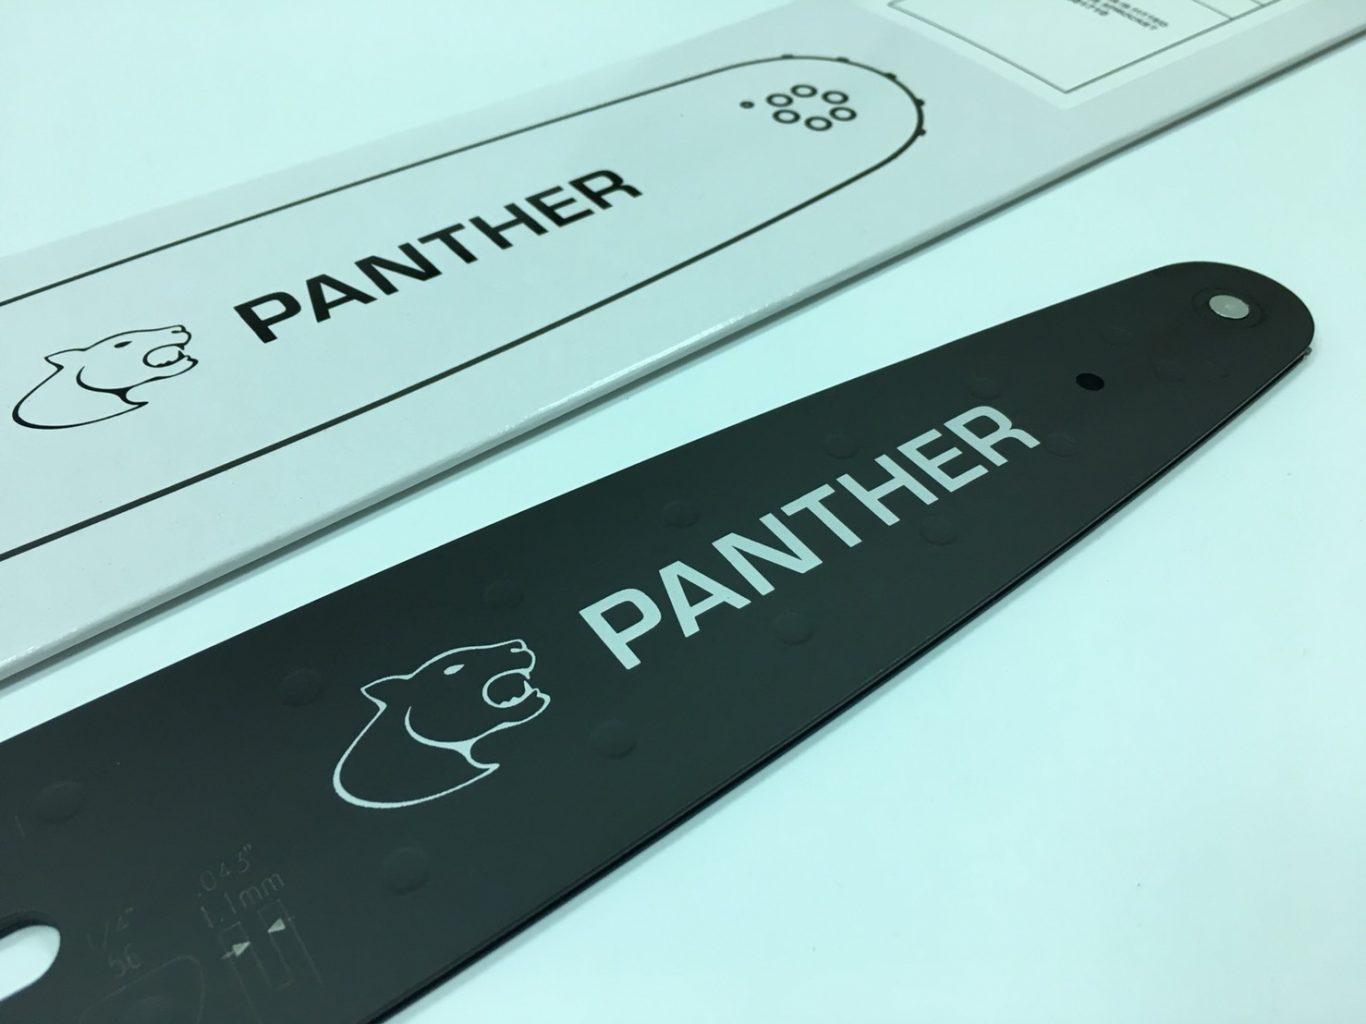 "E20-D2-42K-CV-1 [MUST Have 1/4 Drive Sprocket Fitted] 20""[50cm] Panther Mini Husky [K095 Mount] 1/4 .043 100 drive links"